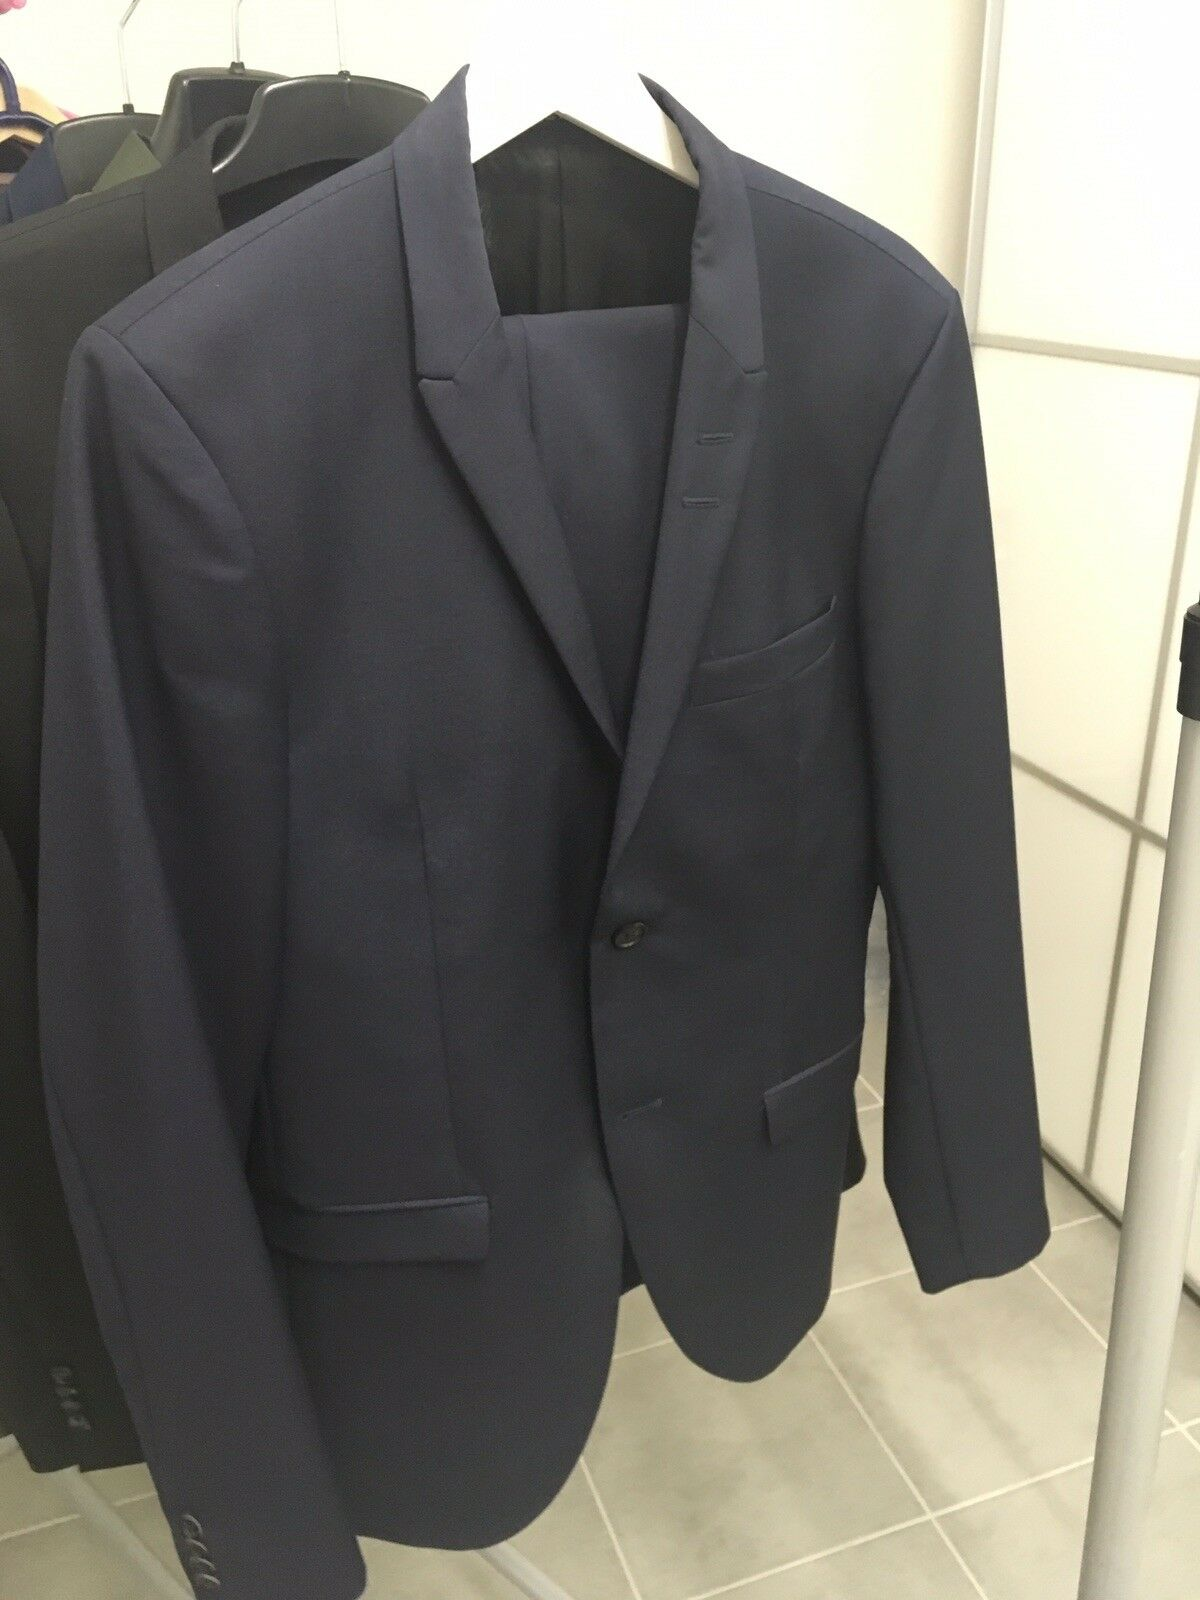 TIGER OF SWEDEN, Anzug, Modell Evert, blau, 48, Wolle/Mohair, slim fit,neuwertig